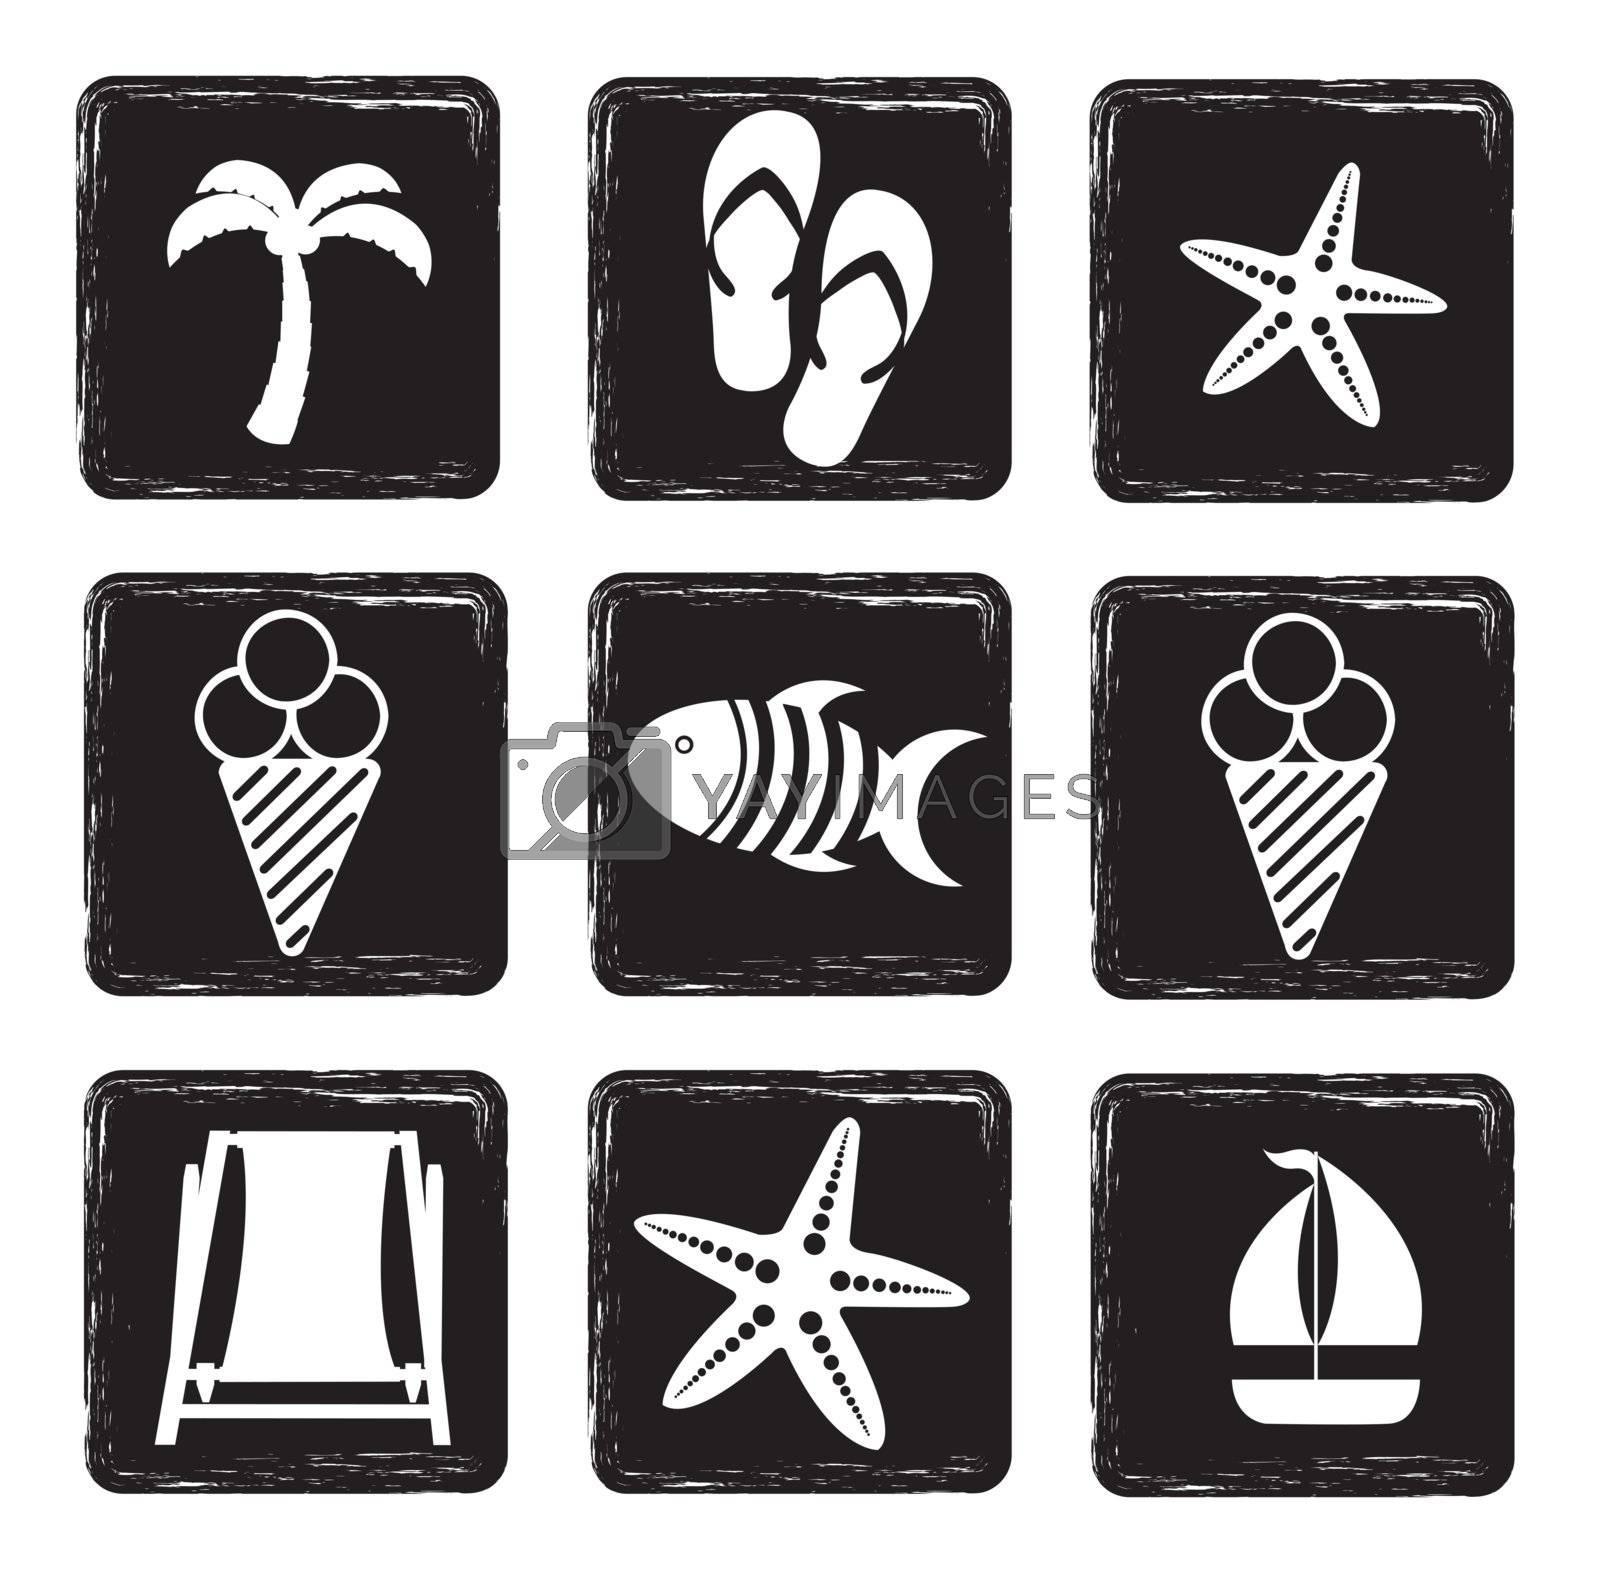 vacation icons by yupiramos